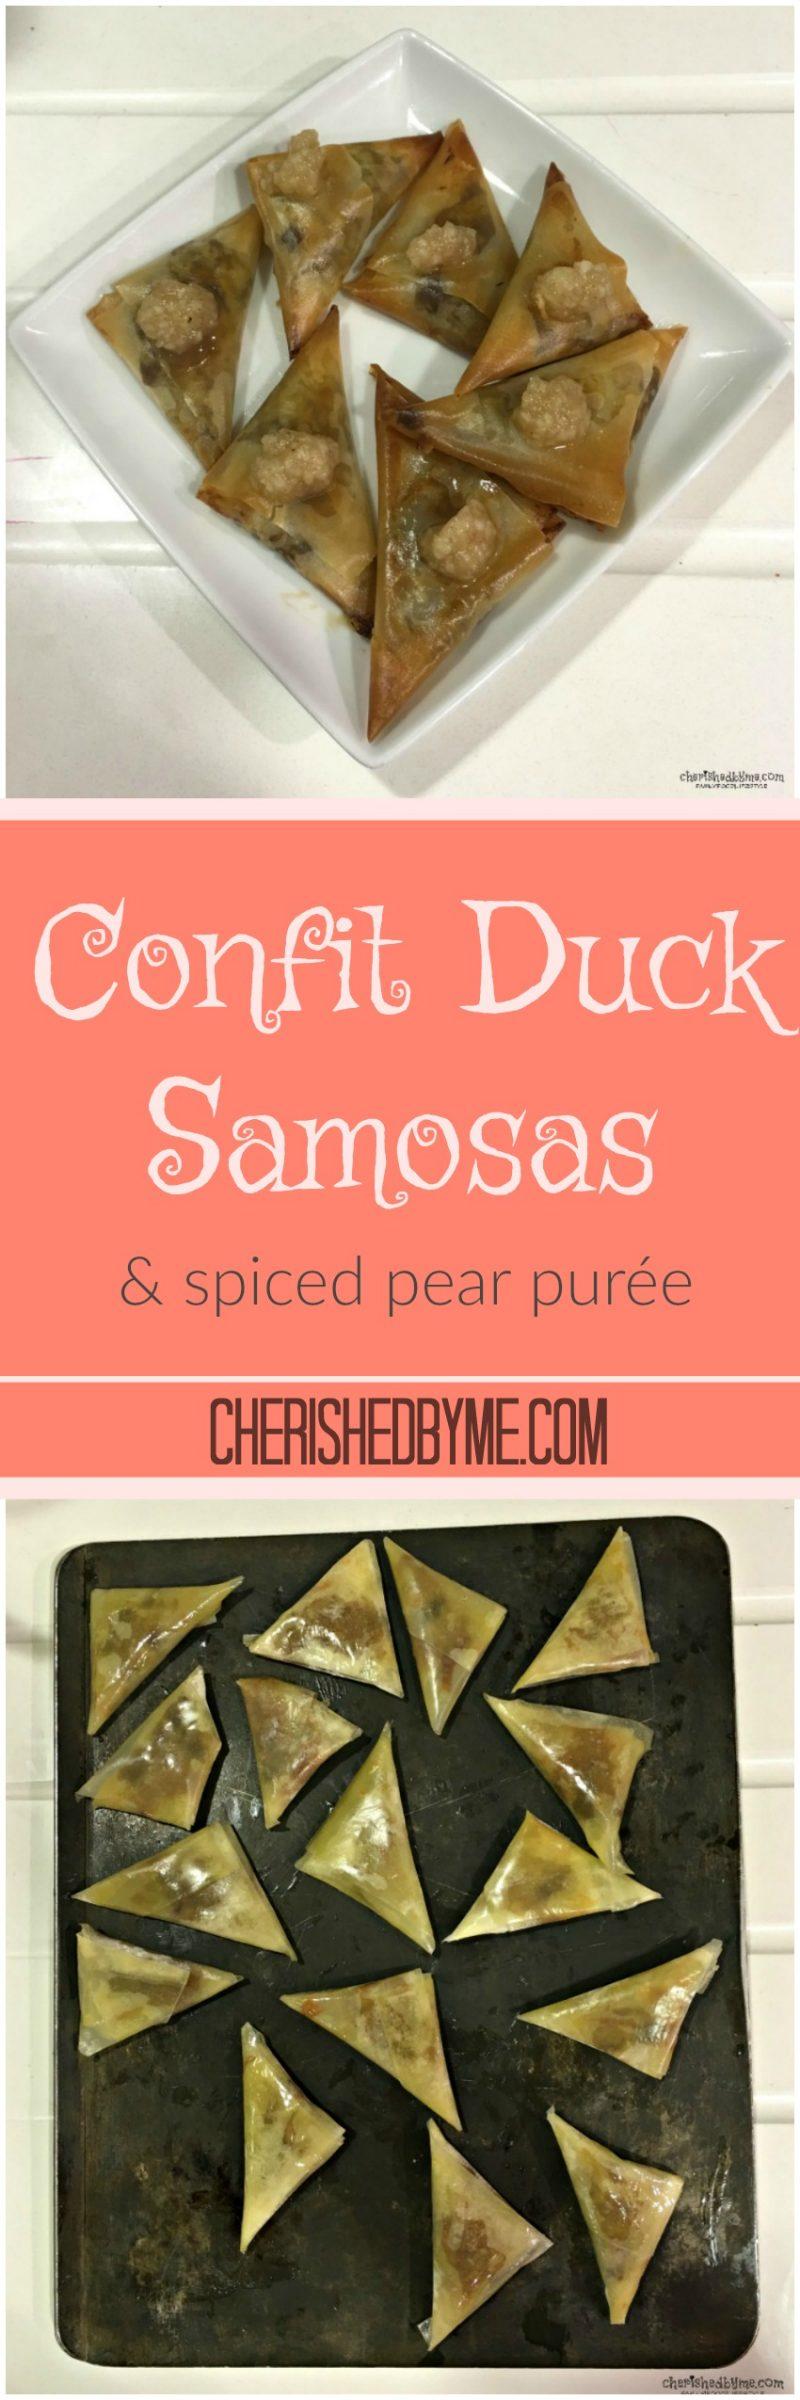 Confit Duck Samosas